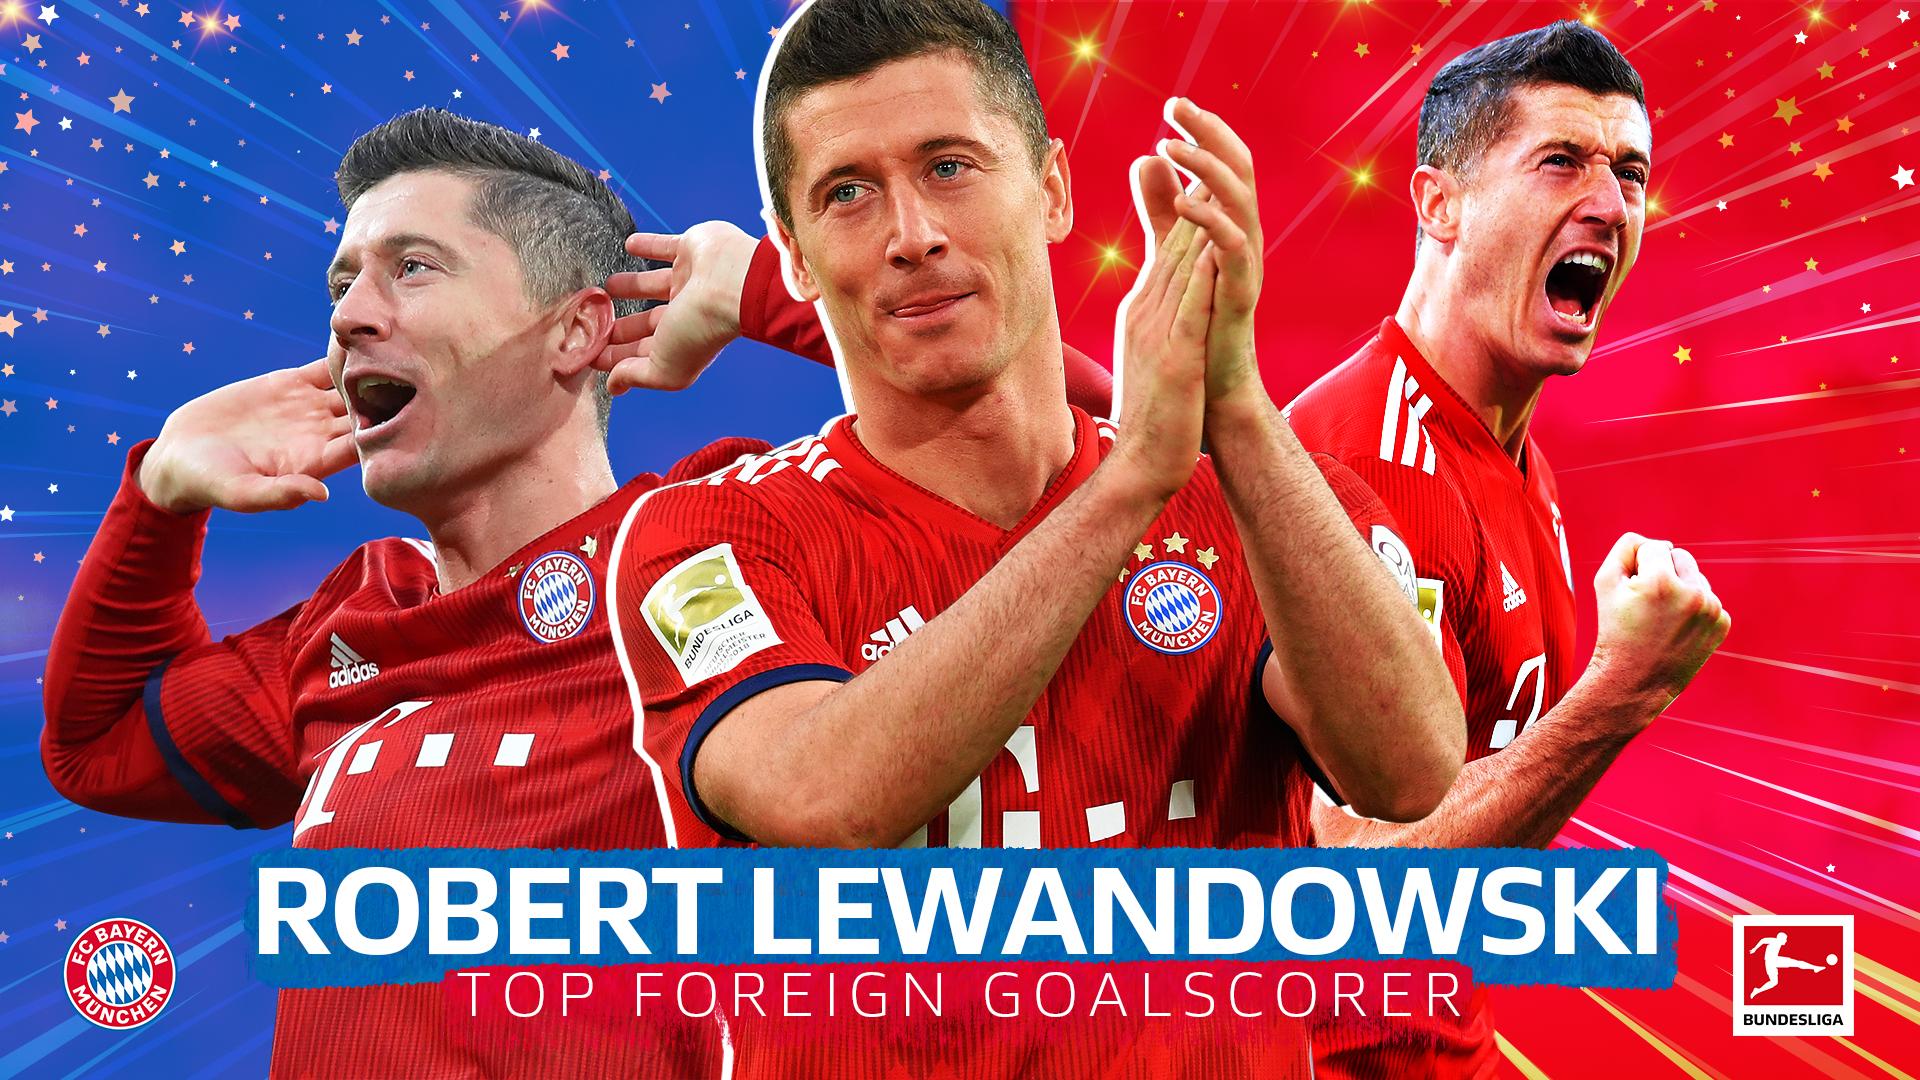 Lewandowski_TopScorer-16x9.jpg